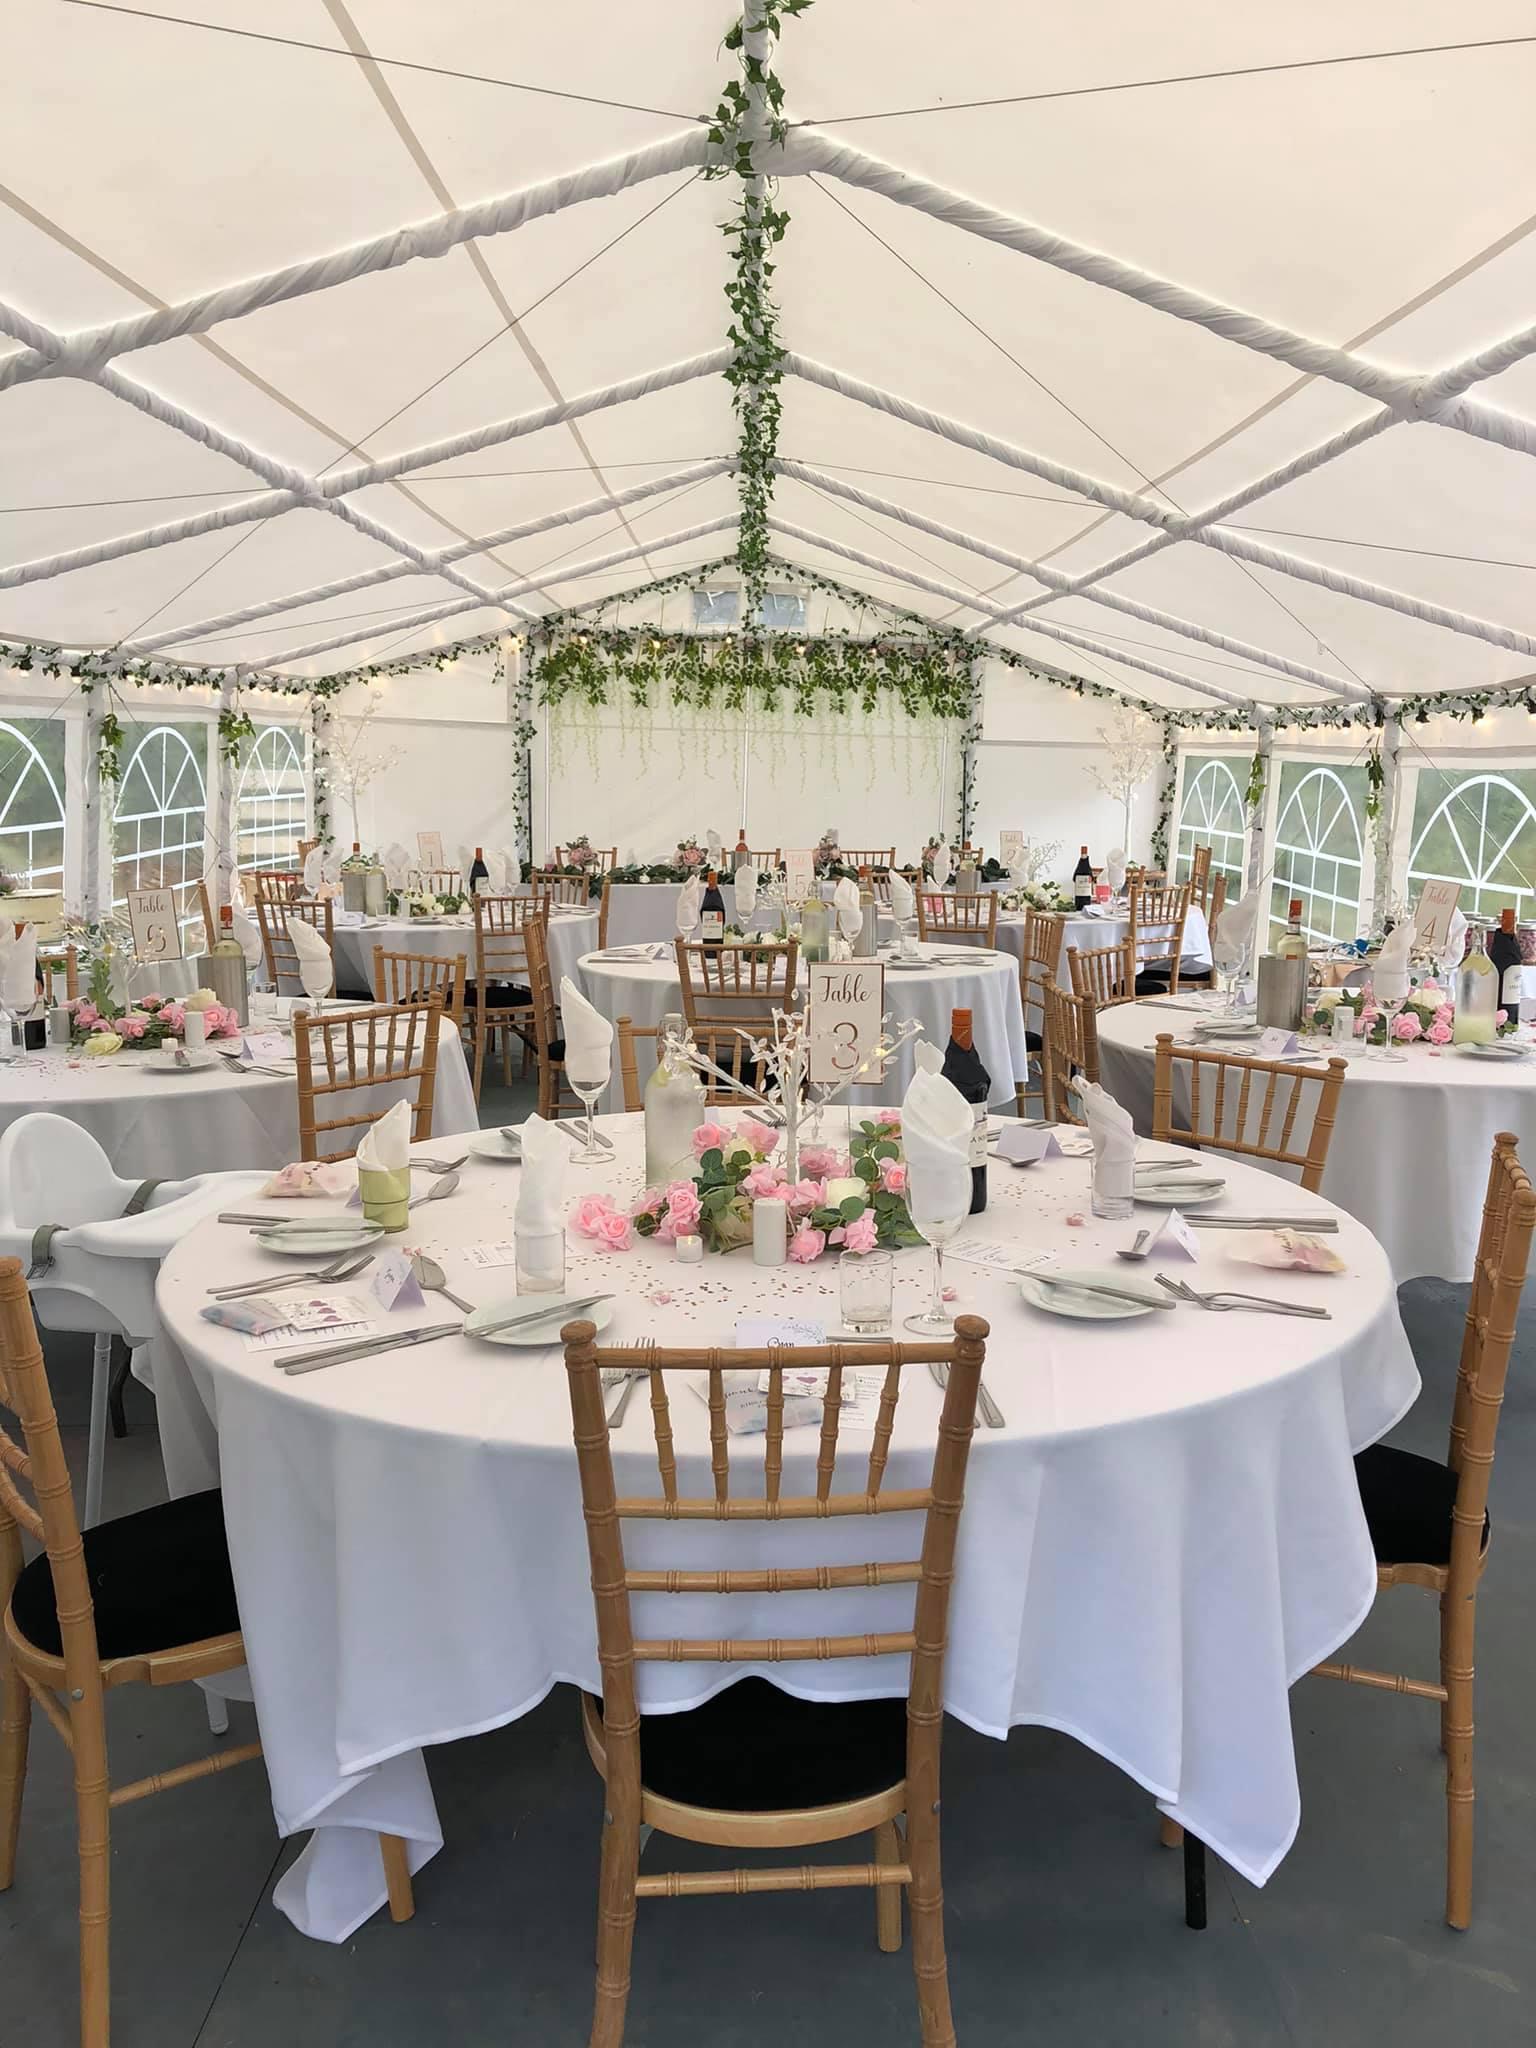 marquee-wedding-bingley-morton-riddlesden-hire